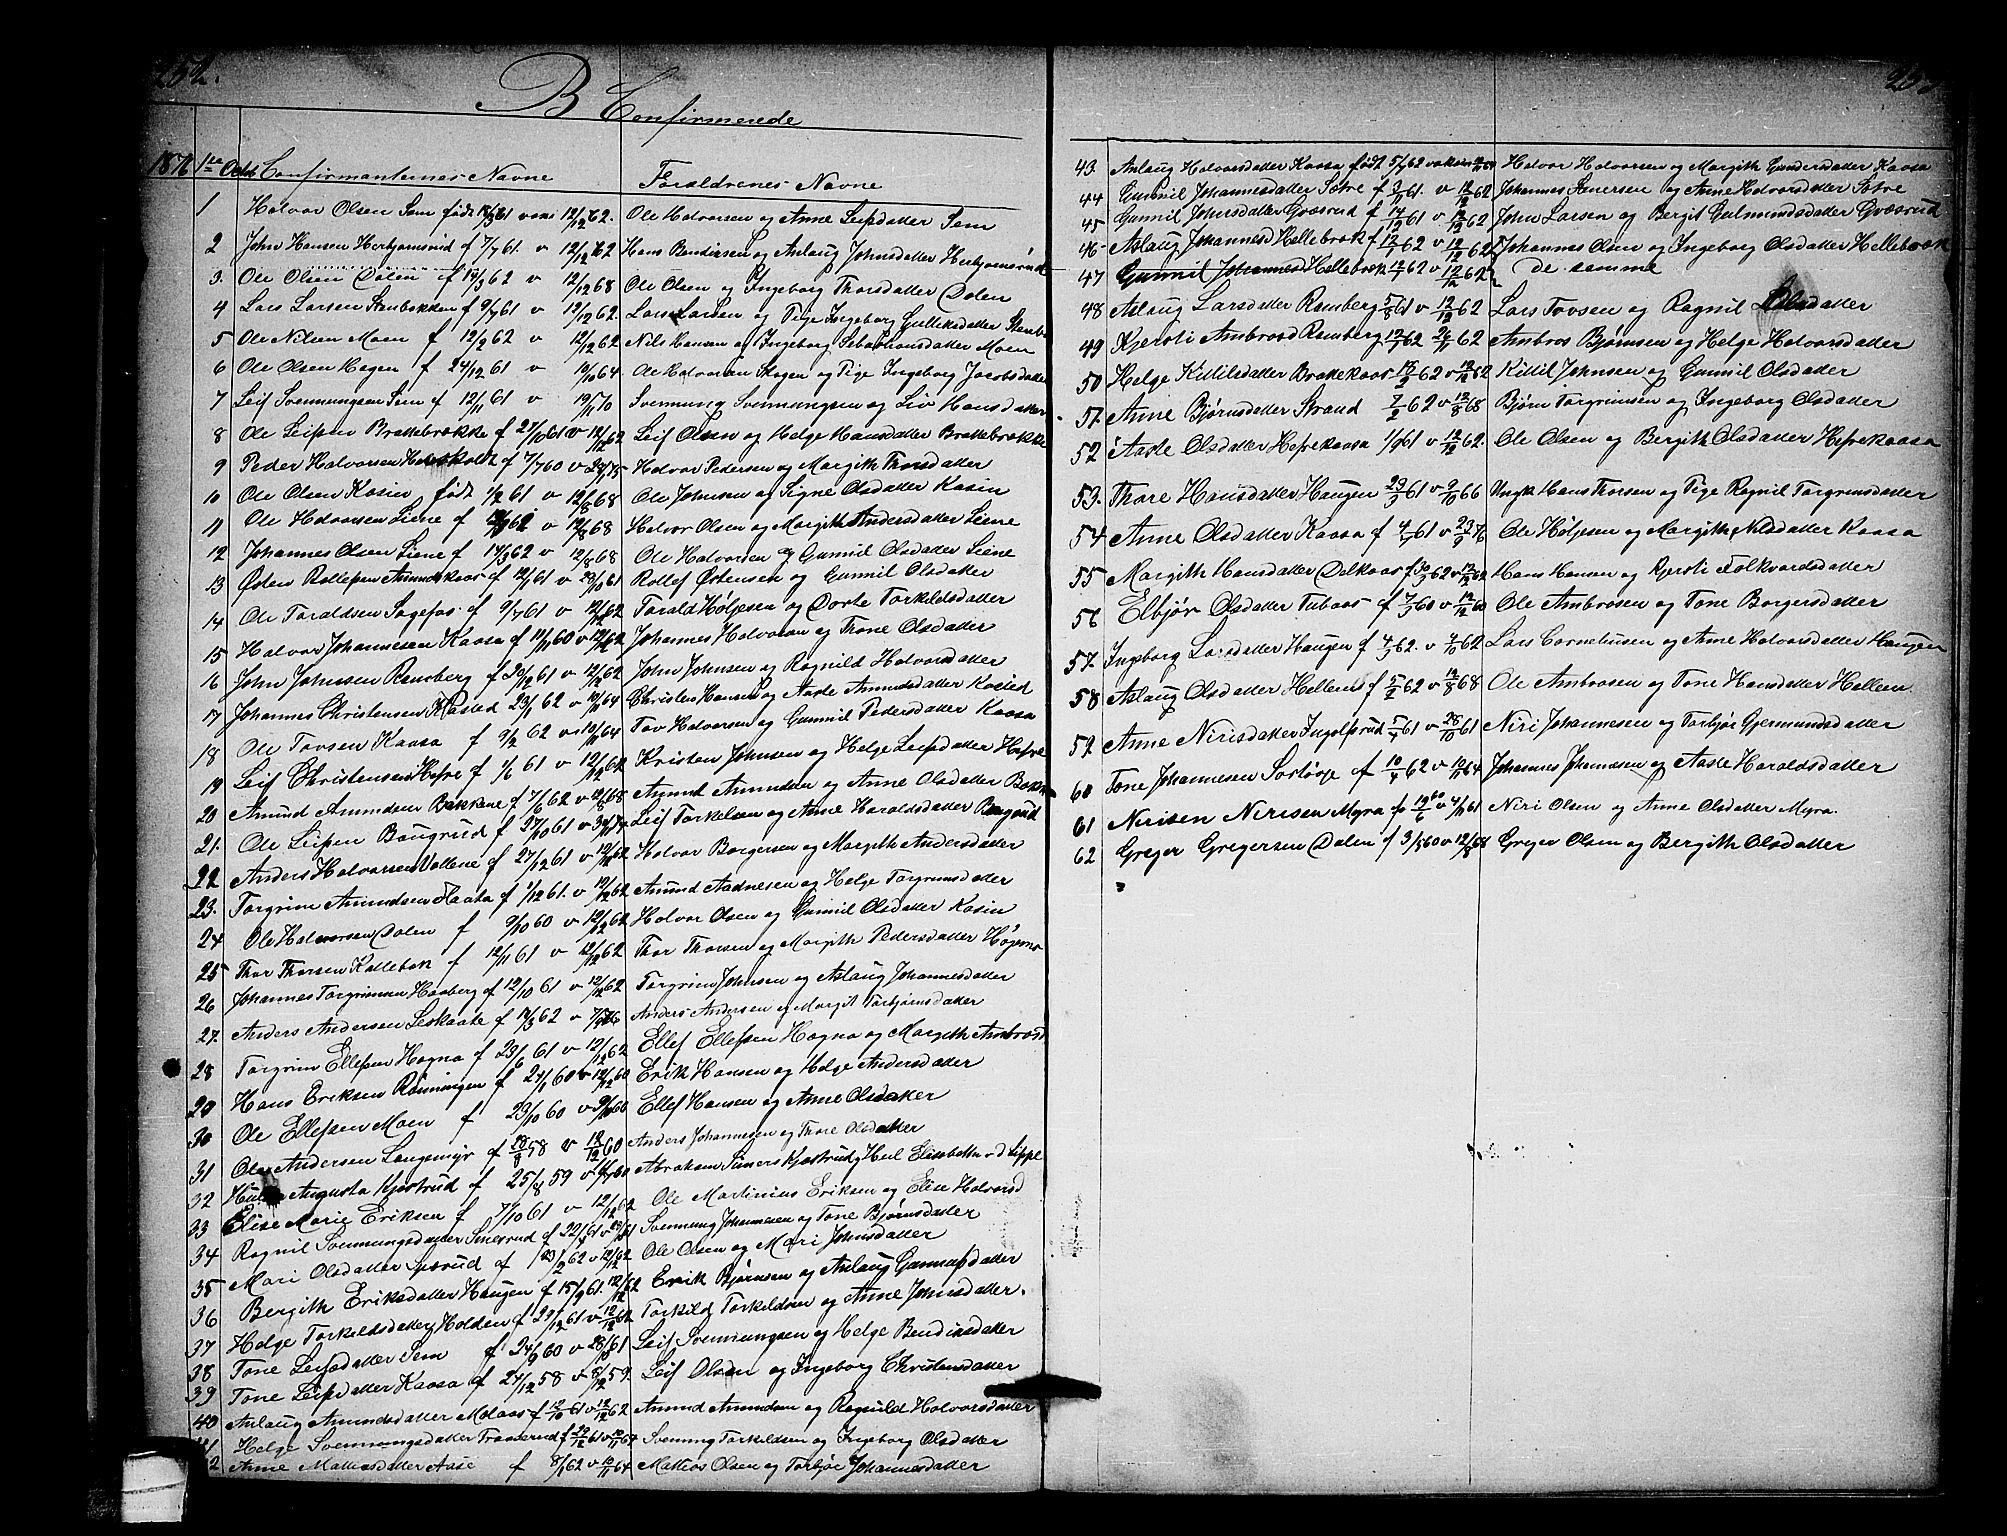 SAKO, Heddal kirkebøker, G/Ga/L0001: Klokkerbok nr. I 1, 1866-1878, s. 252-253